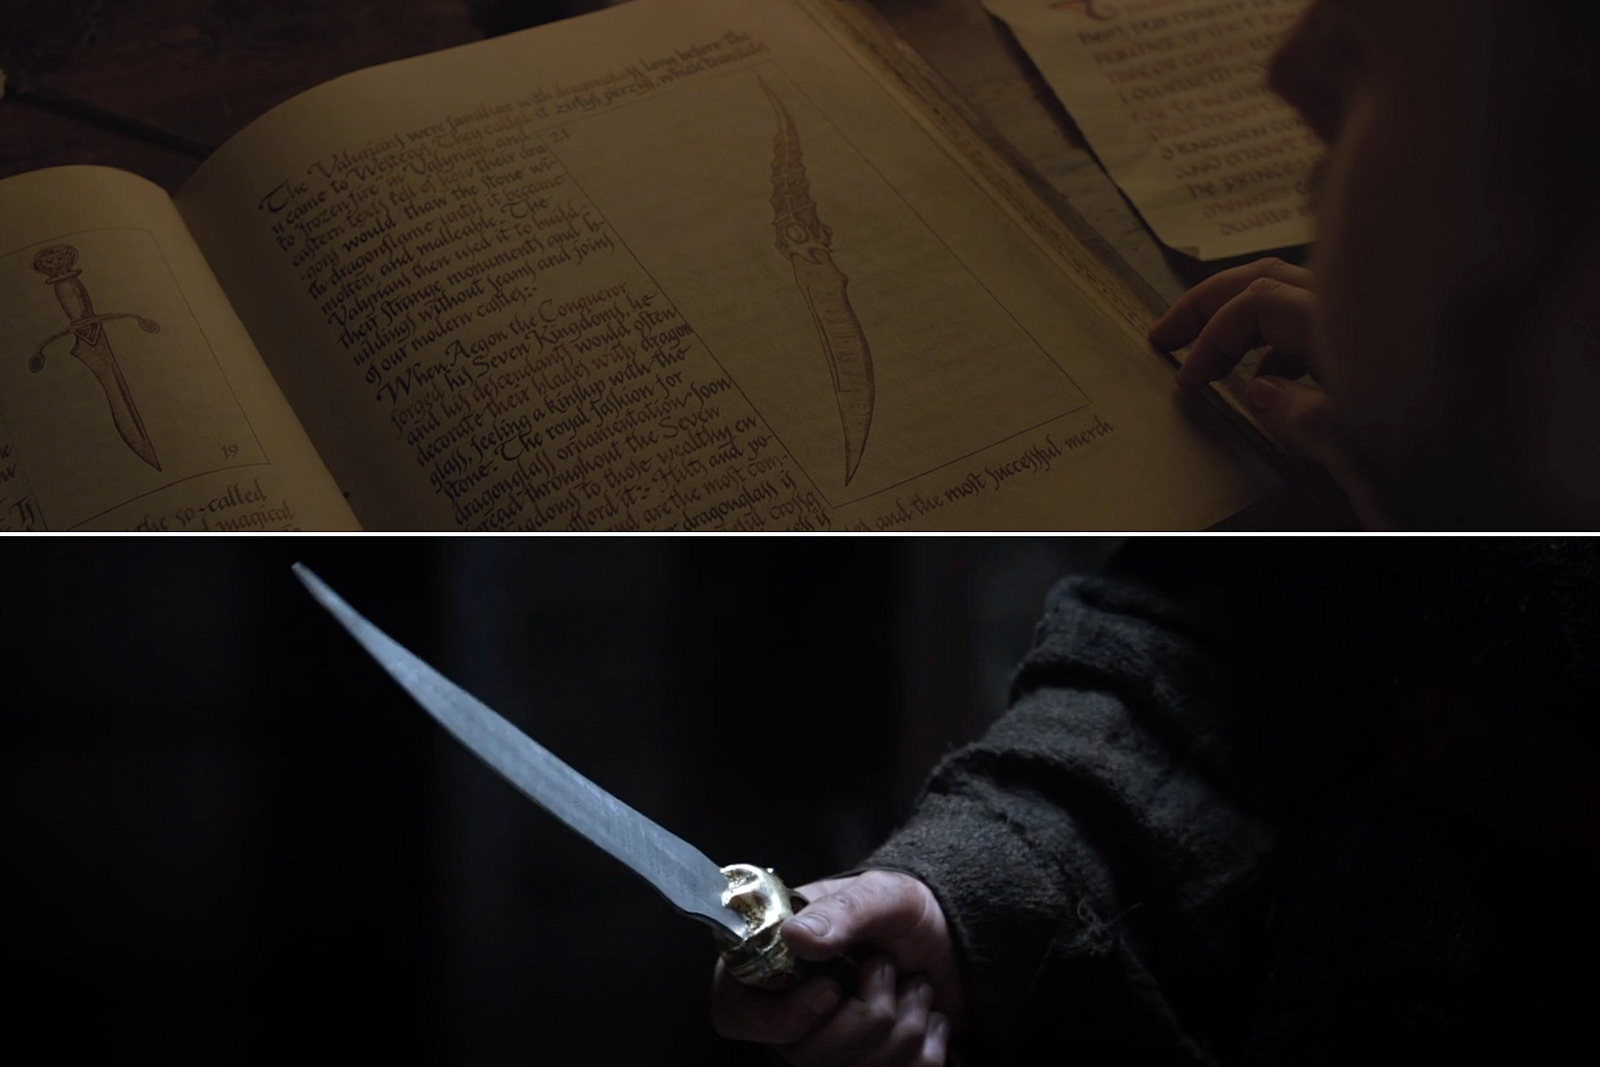 catspaw-dagger-dragonstone-game-of-thrones